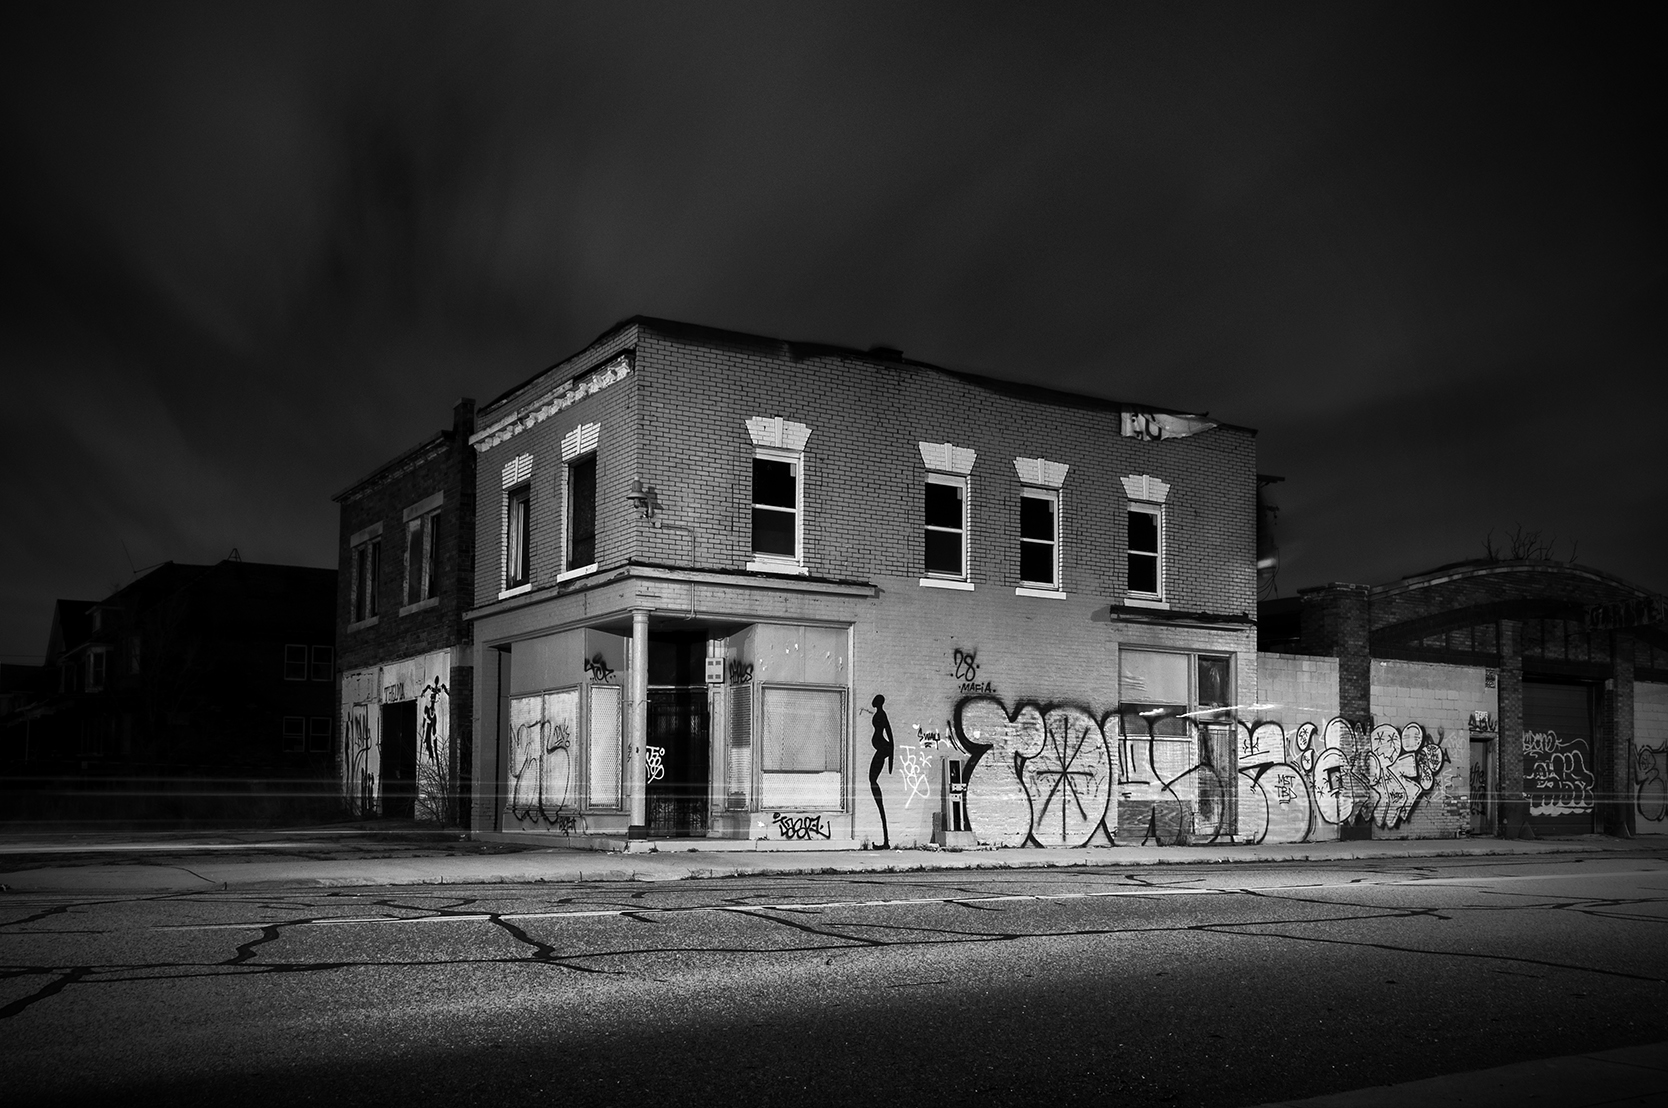 Oakland St. 2013